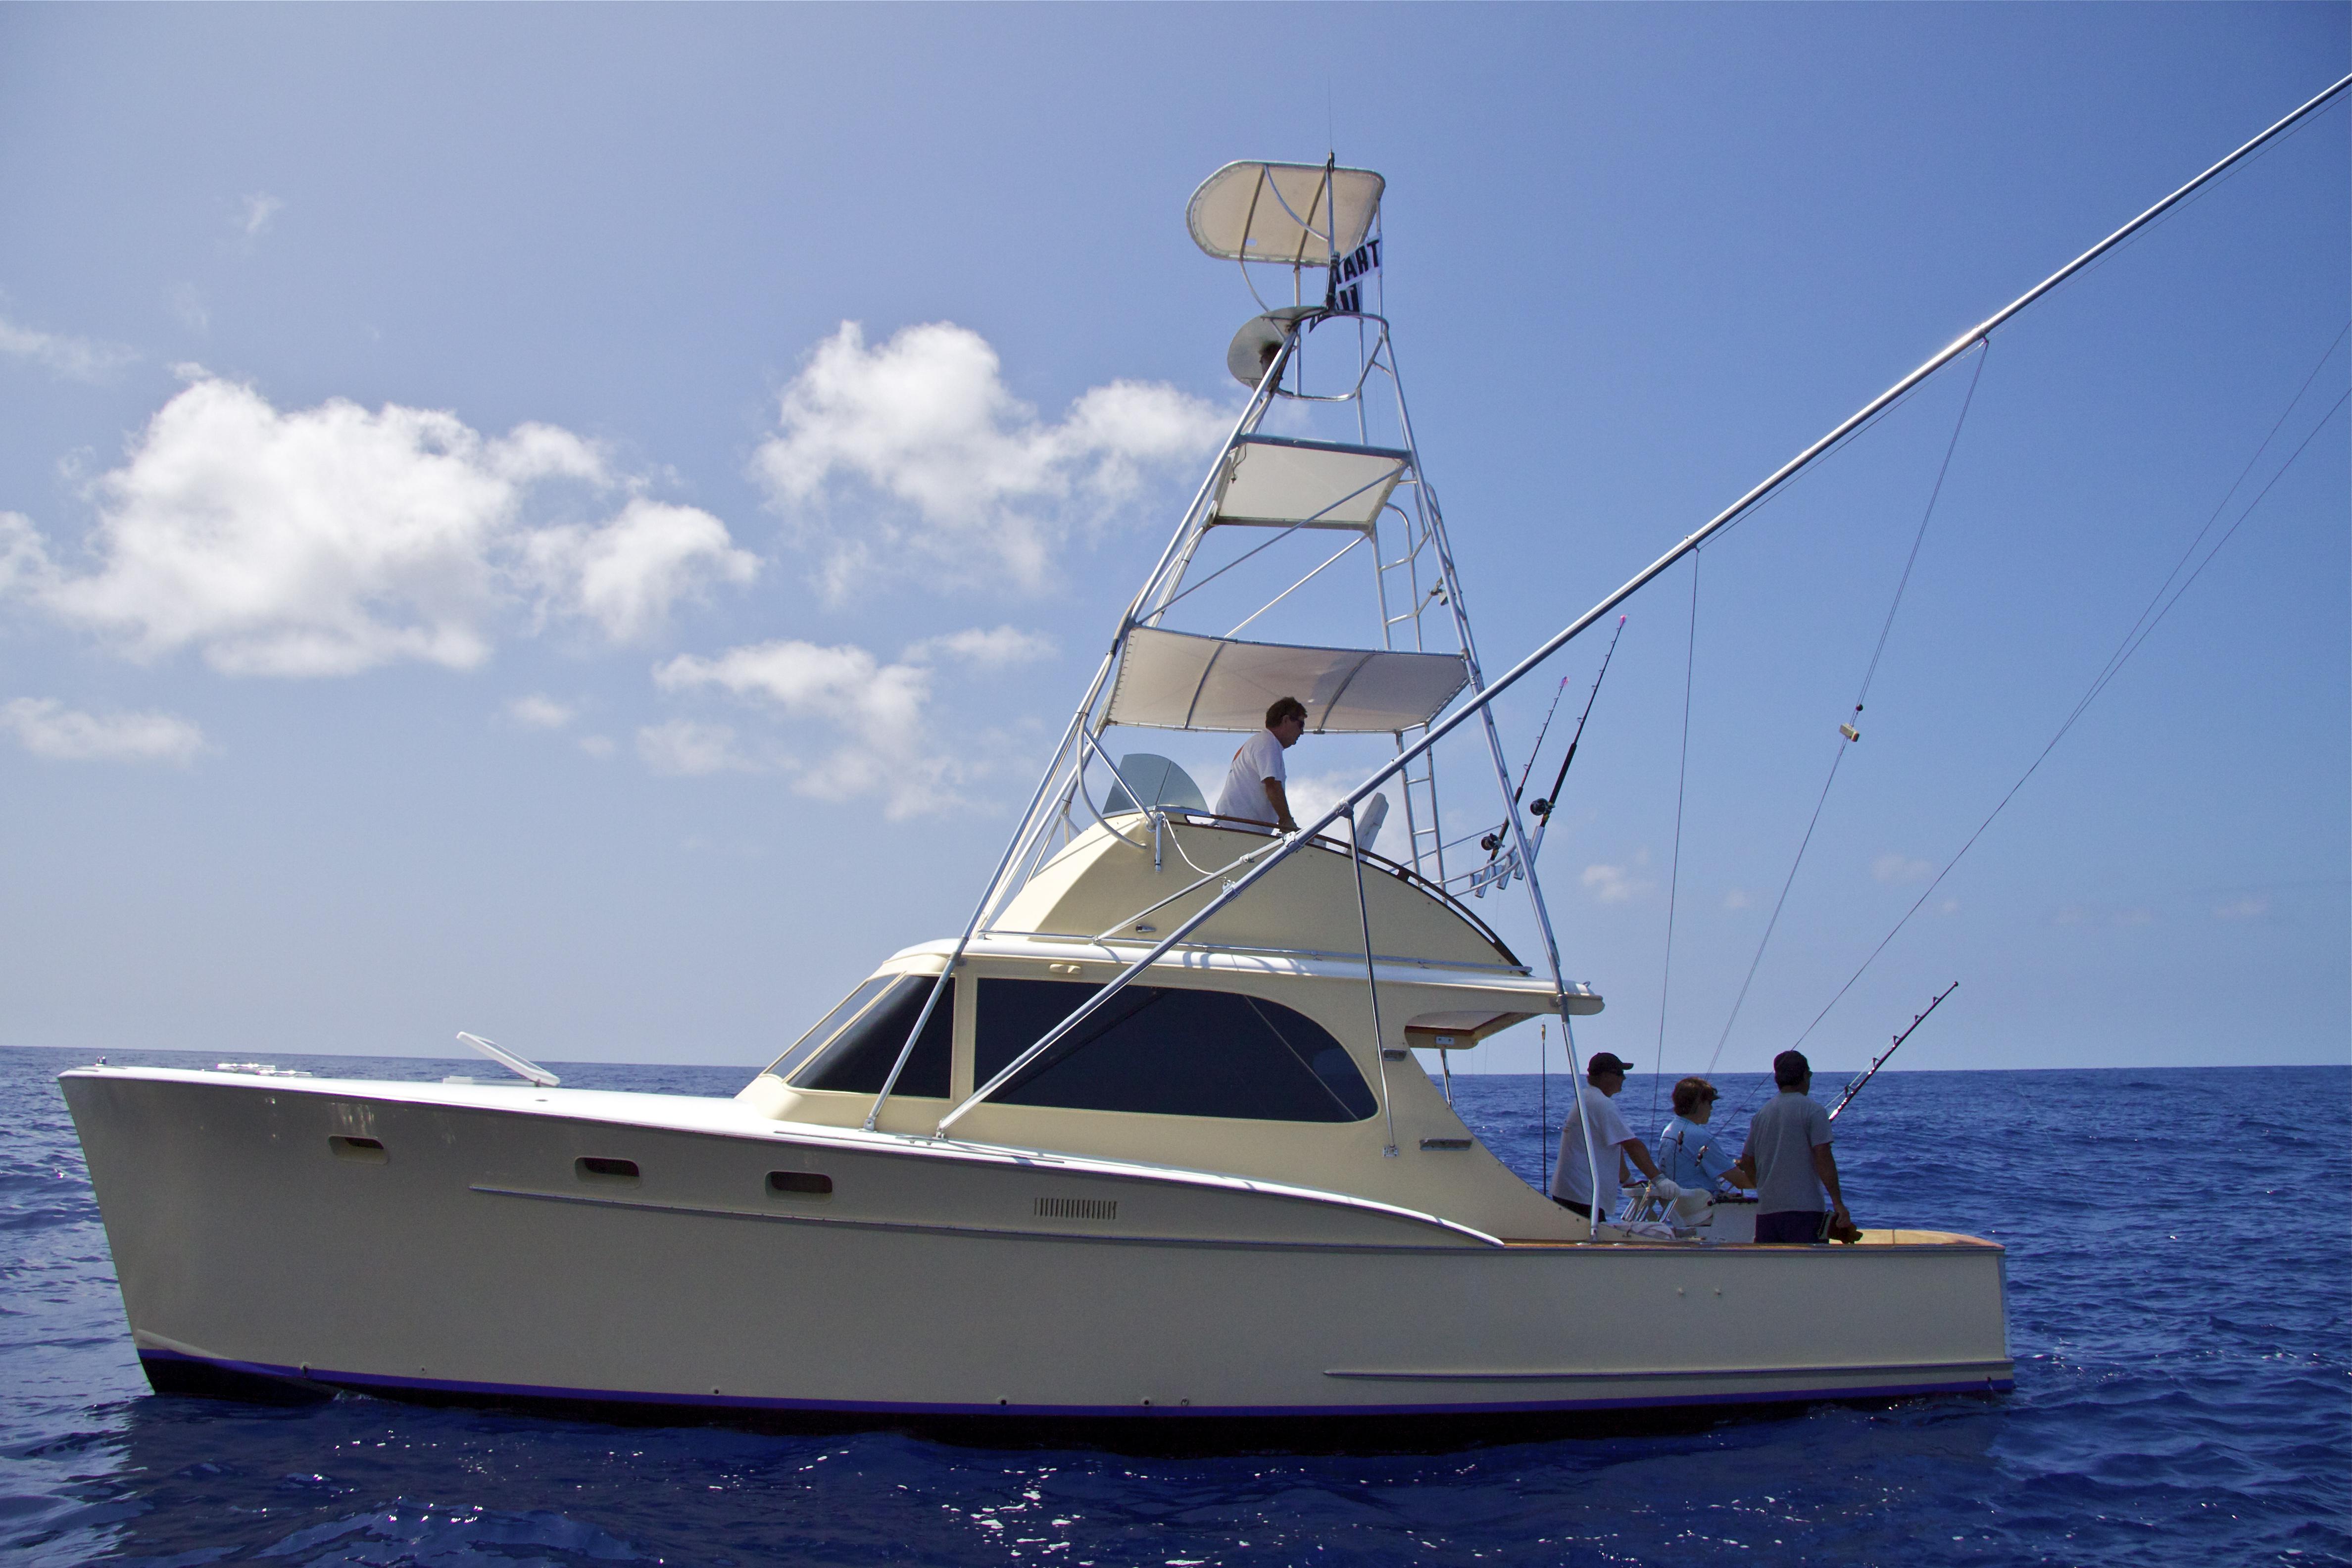 Hawaii fishing charter kona sportfishing for Kona hawaii fishing